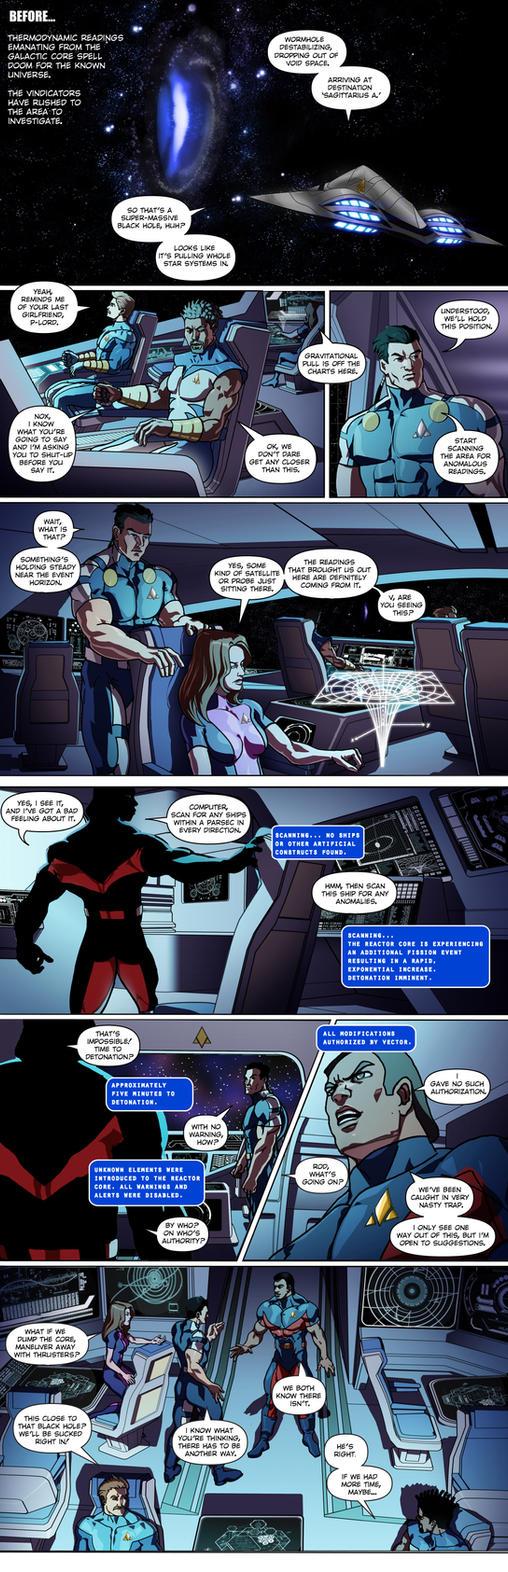 MOCC 2 Final Chapter p23-24 by RODCOM1000